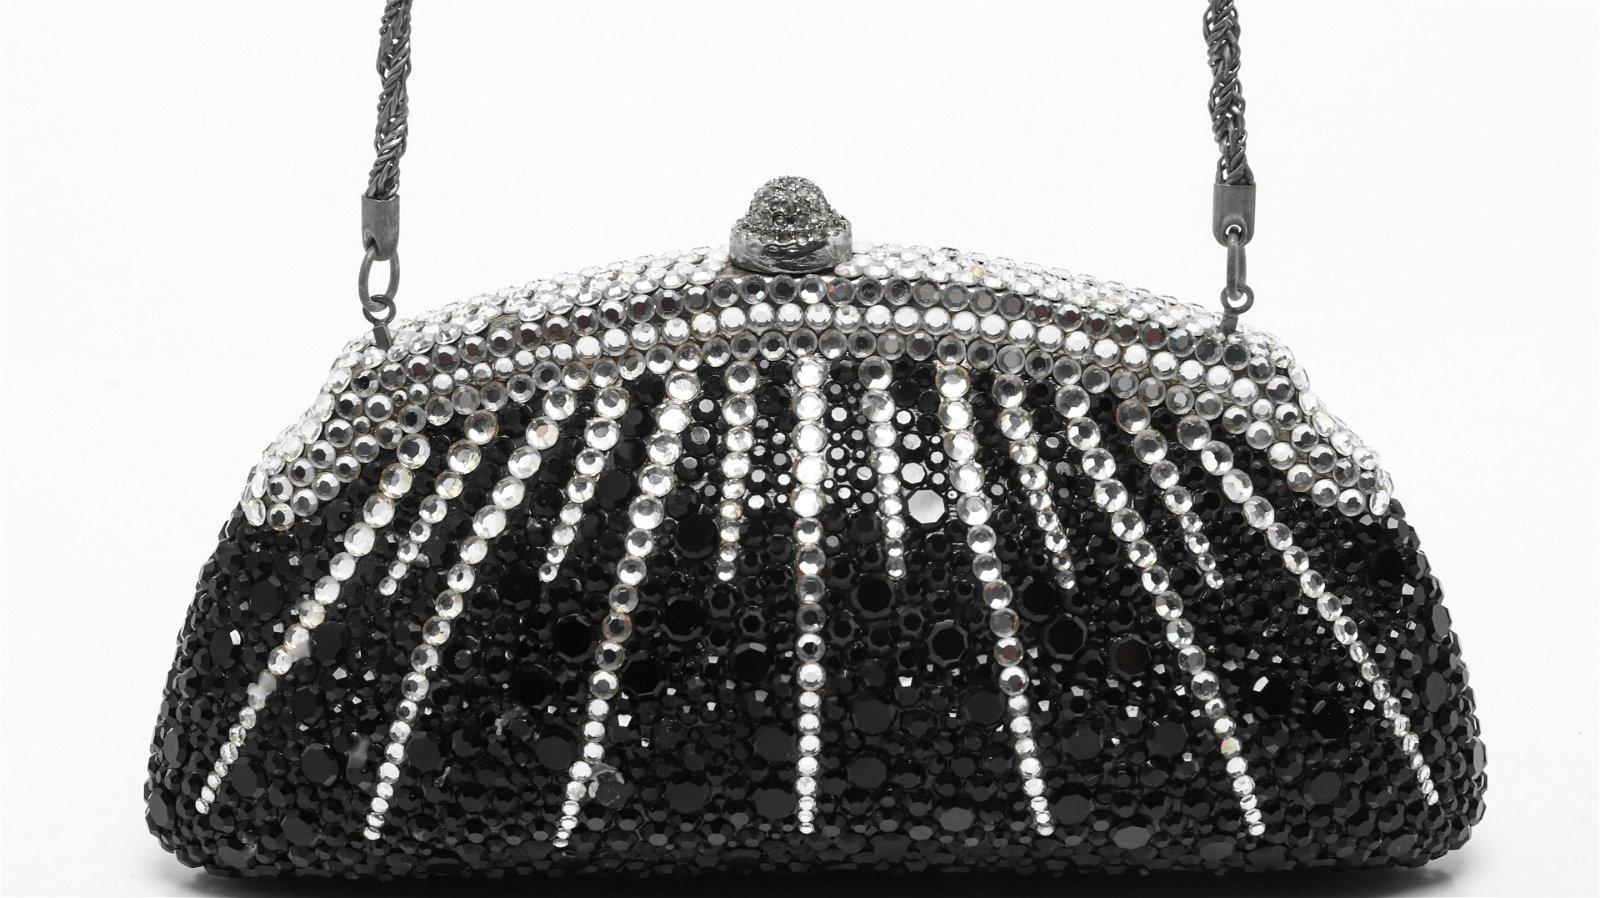 Givenchy Vintage Rhinestone Minaudiere Evening Bag